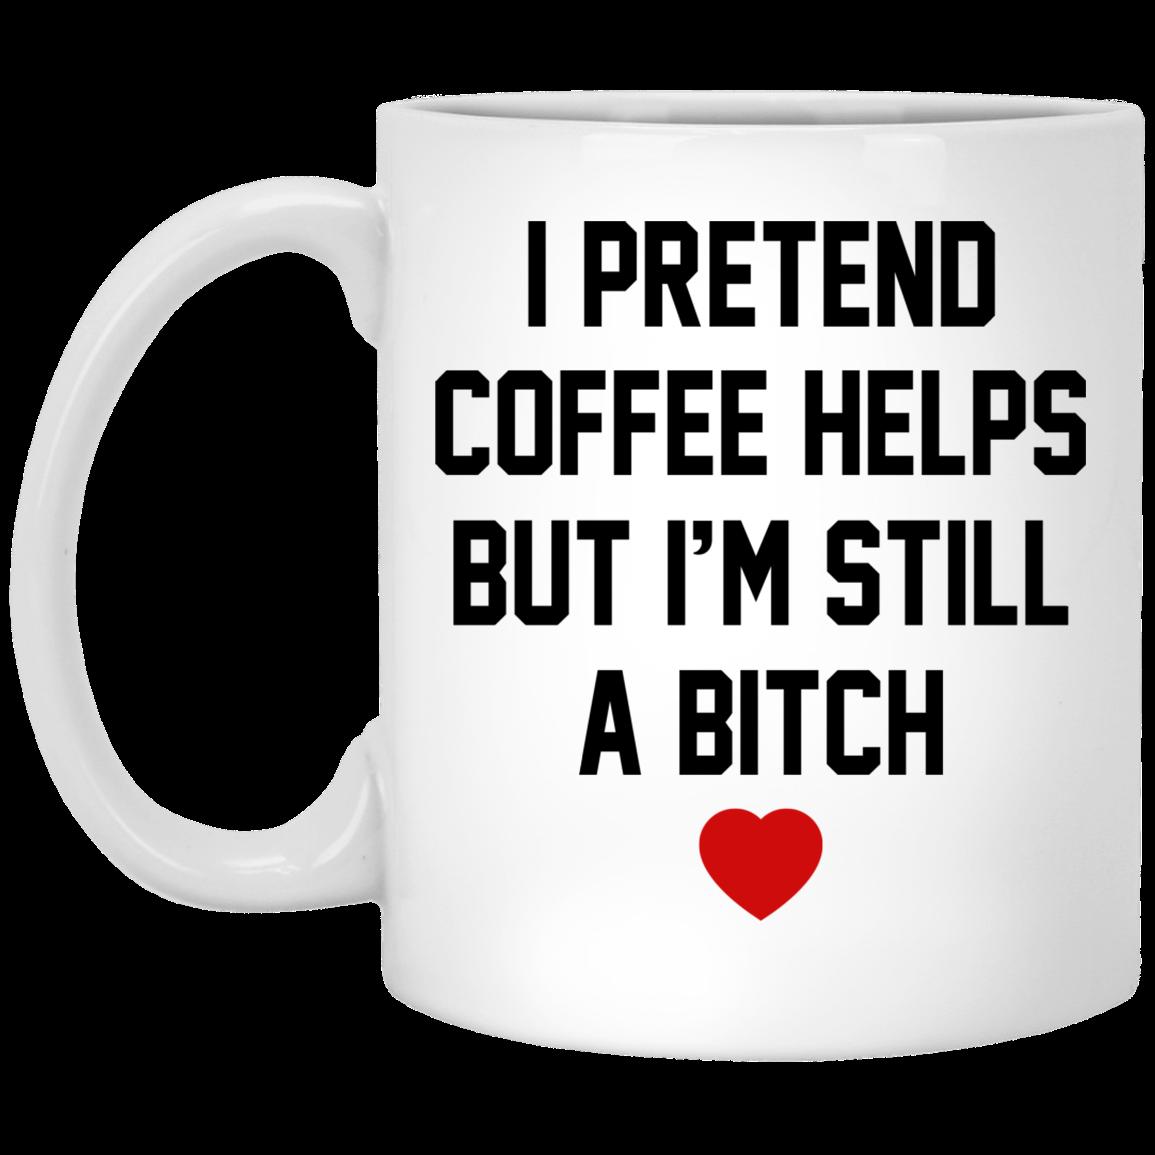 I Pretend Coffee Helps But I'm Still A Bitch Mugs